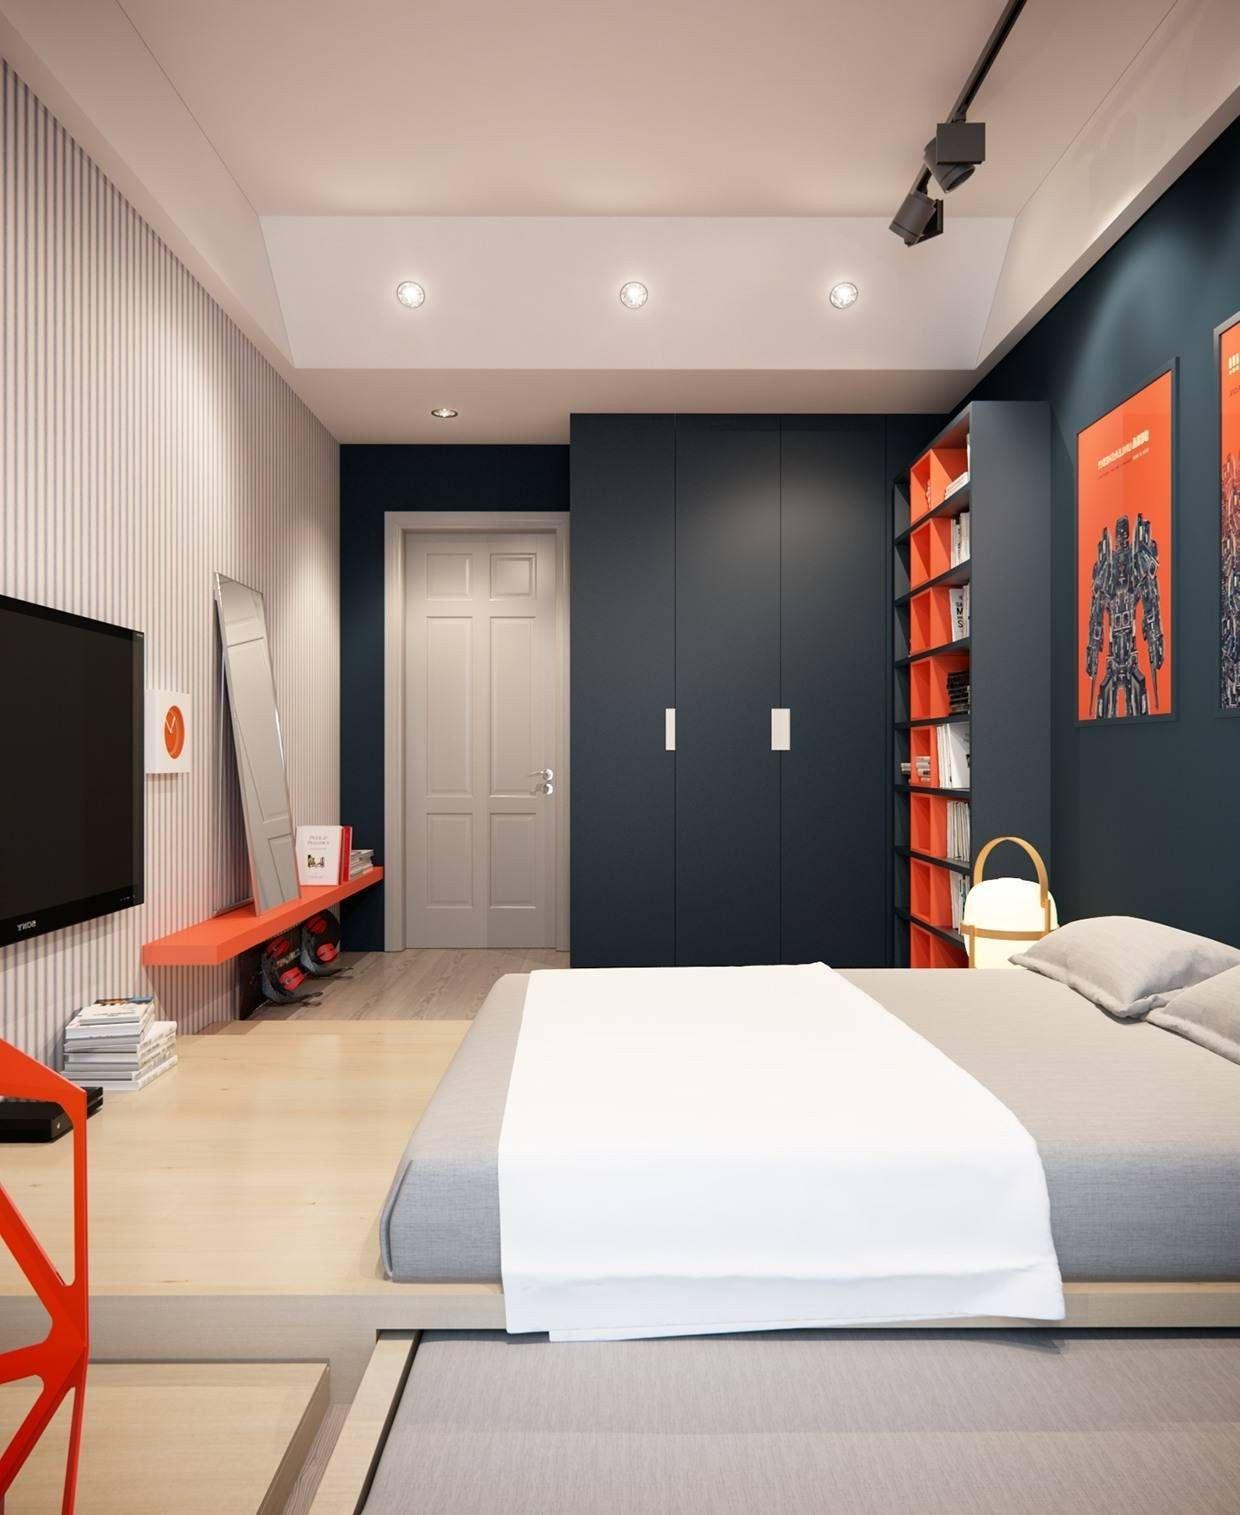 Cool Boy Bedroom Ideas Inspirational Pin Di Teen Bedroom Ideas